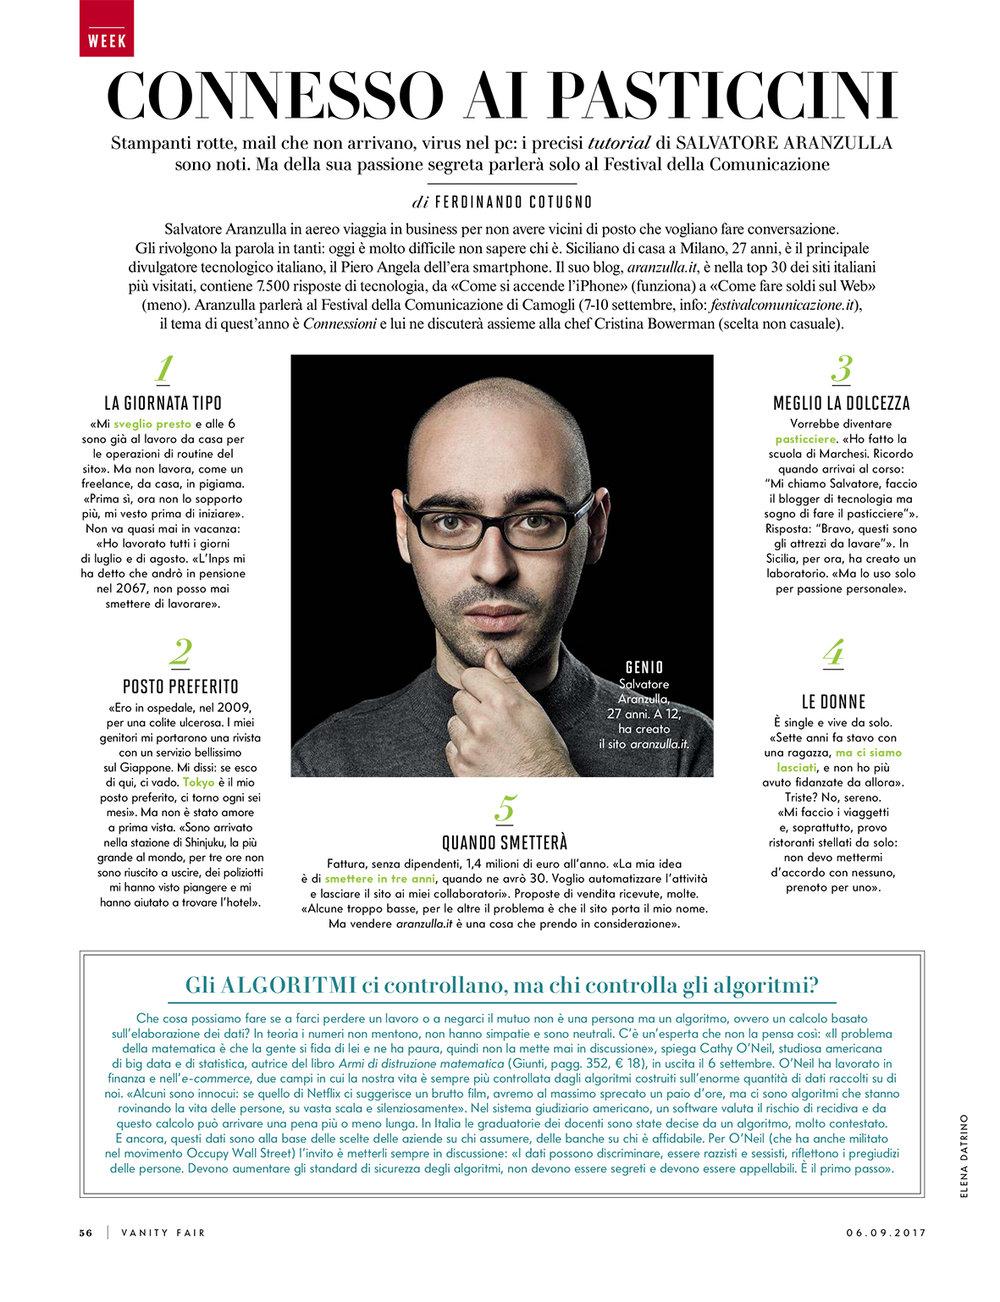 Vanity Fair Italia, september 2017